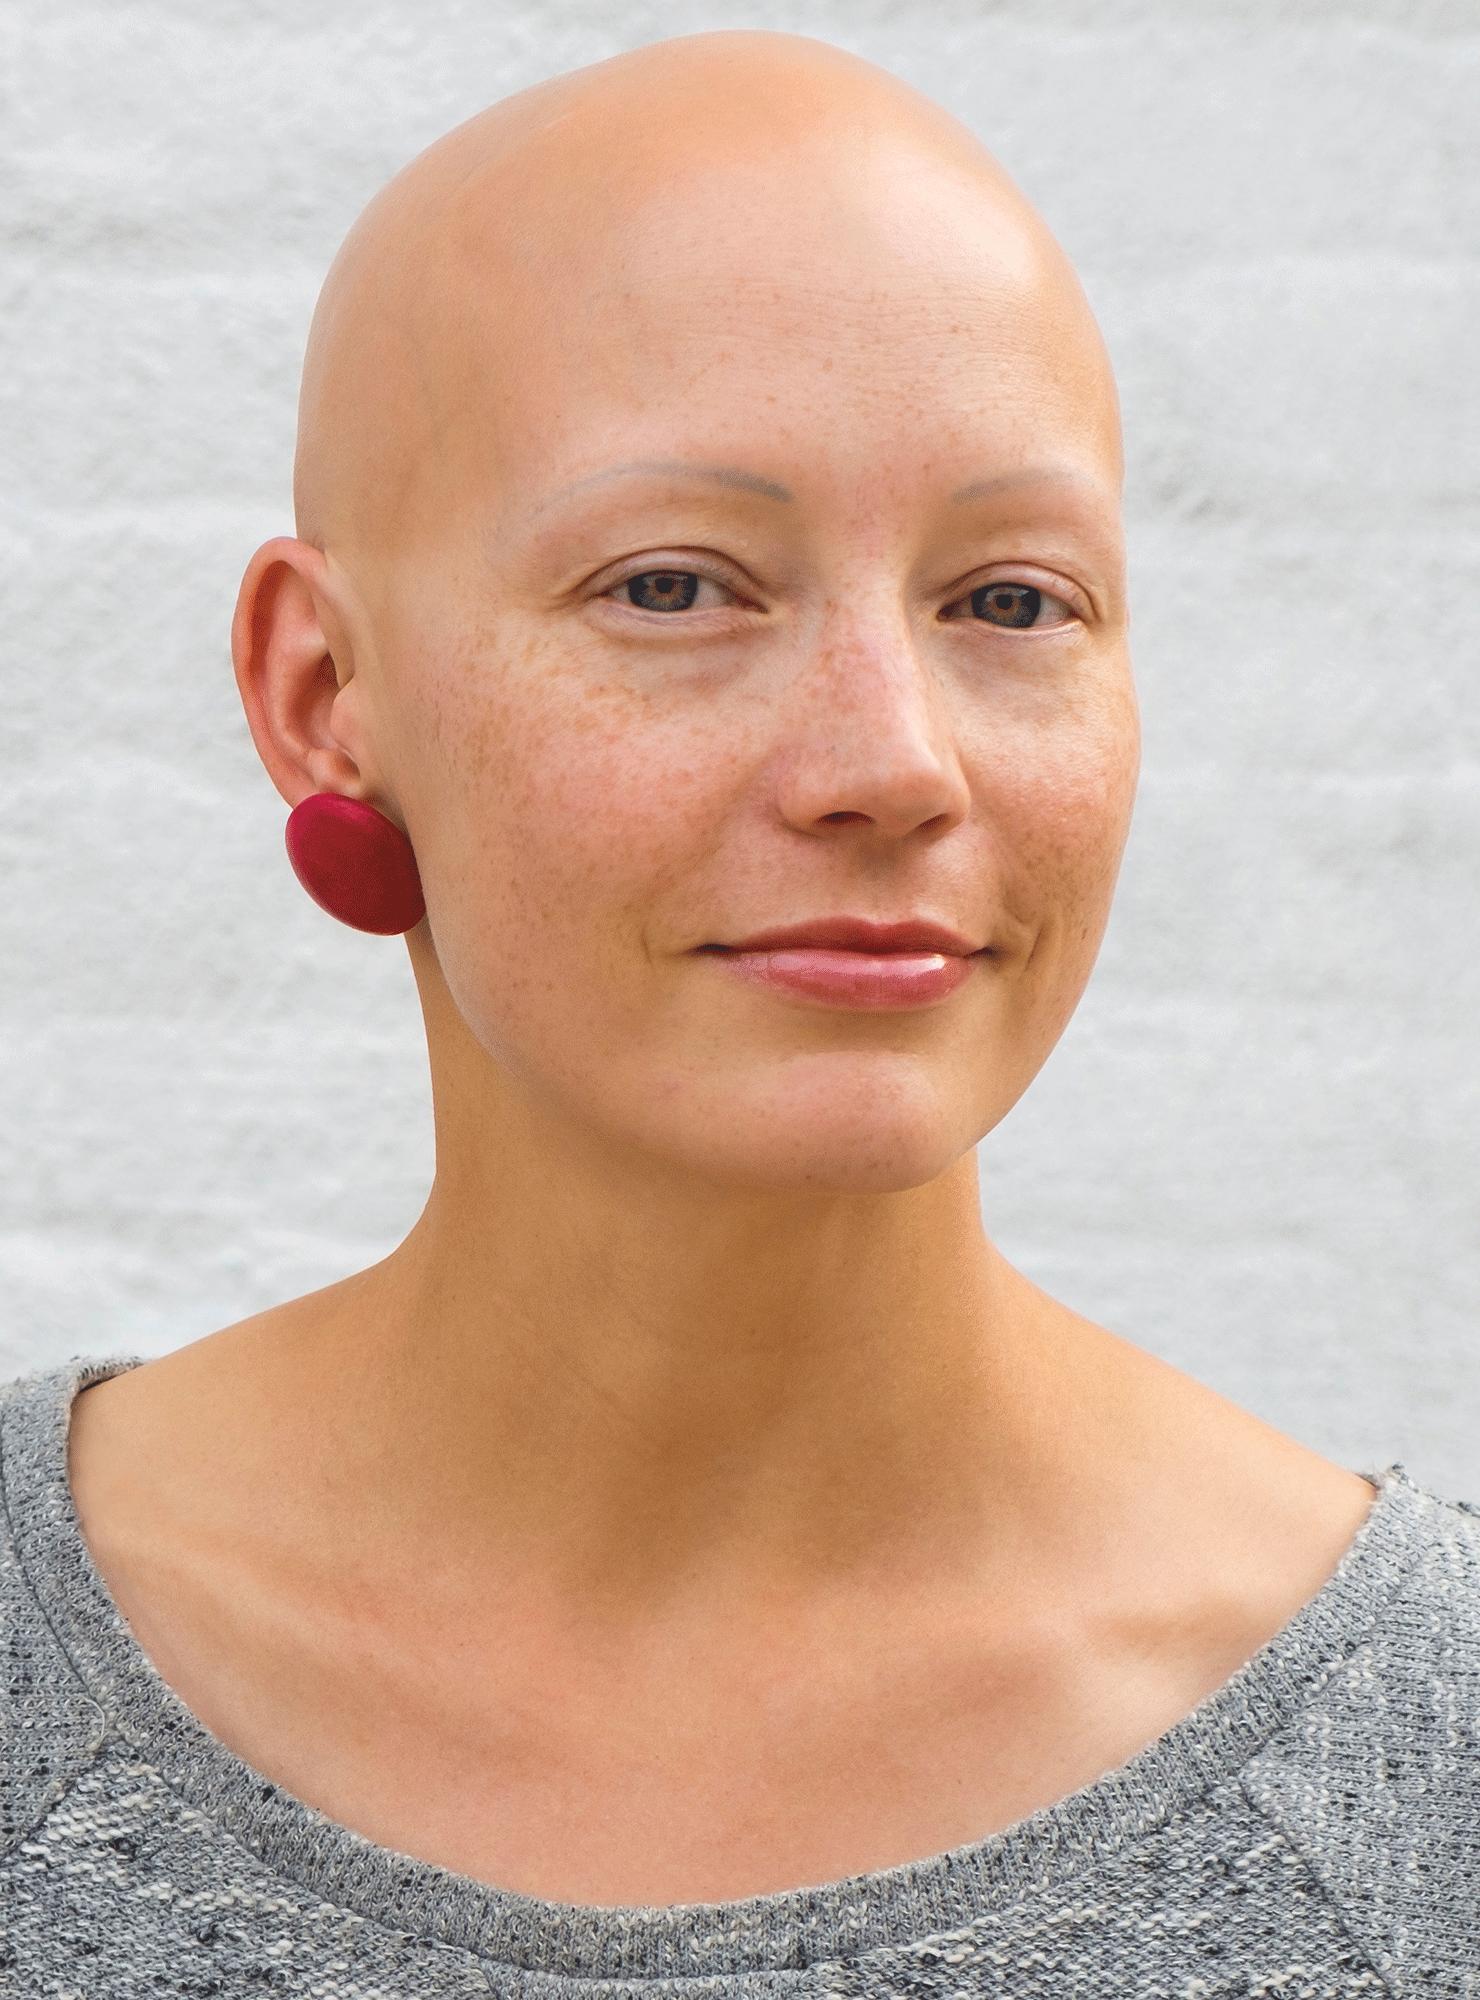 Bald, black and beautiful